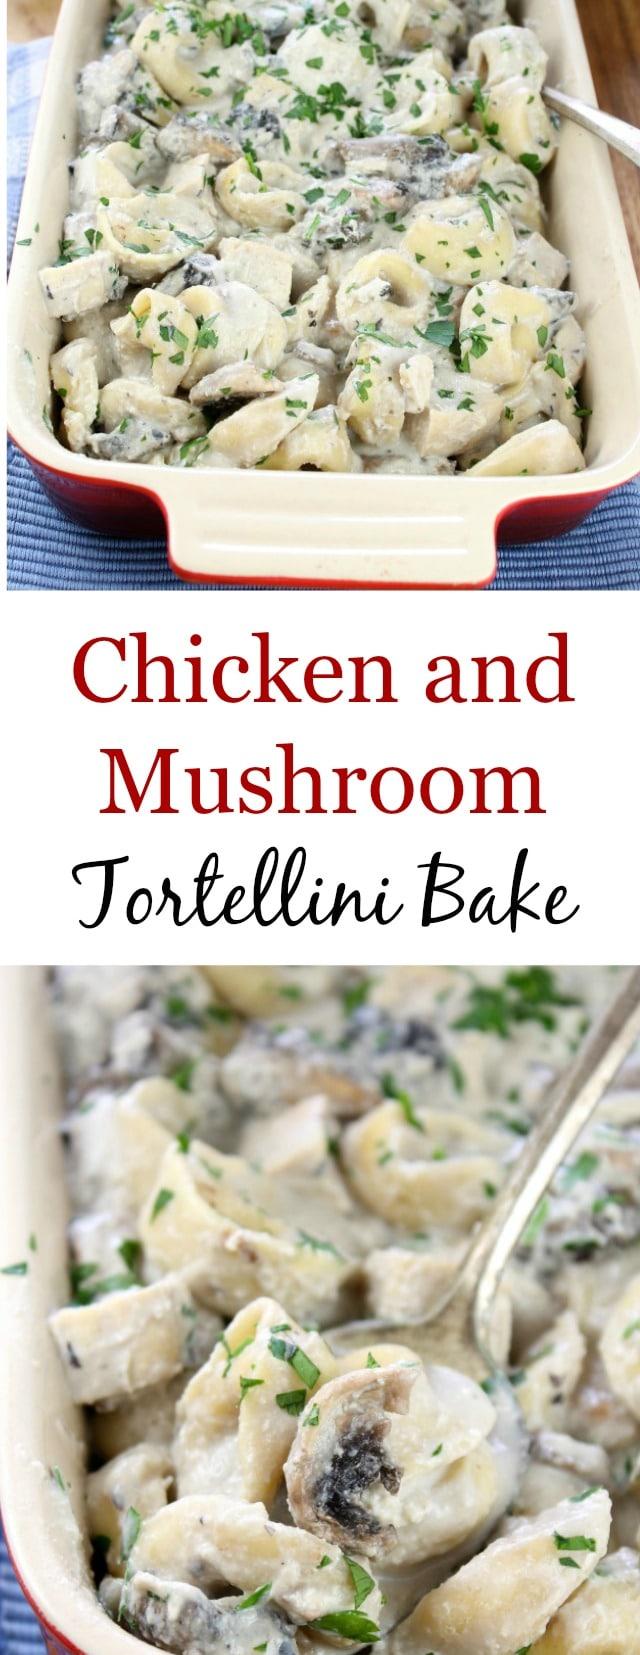 Chicken and Mushroom Tortellini Bake ~ Amazing comfort food. Recipe found at missinthekitchen.com